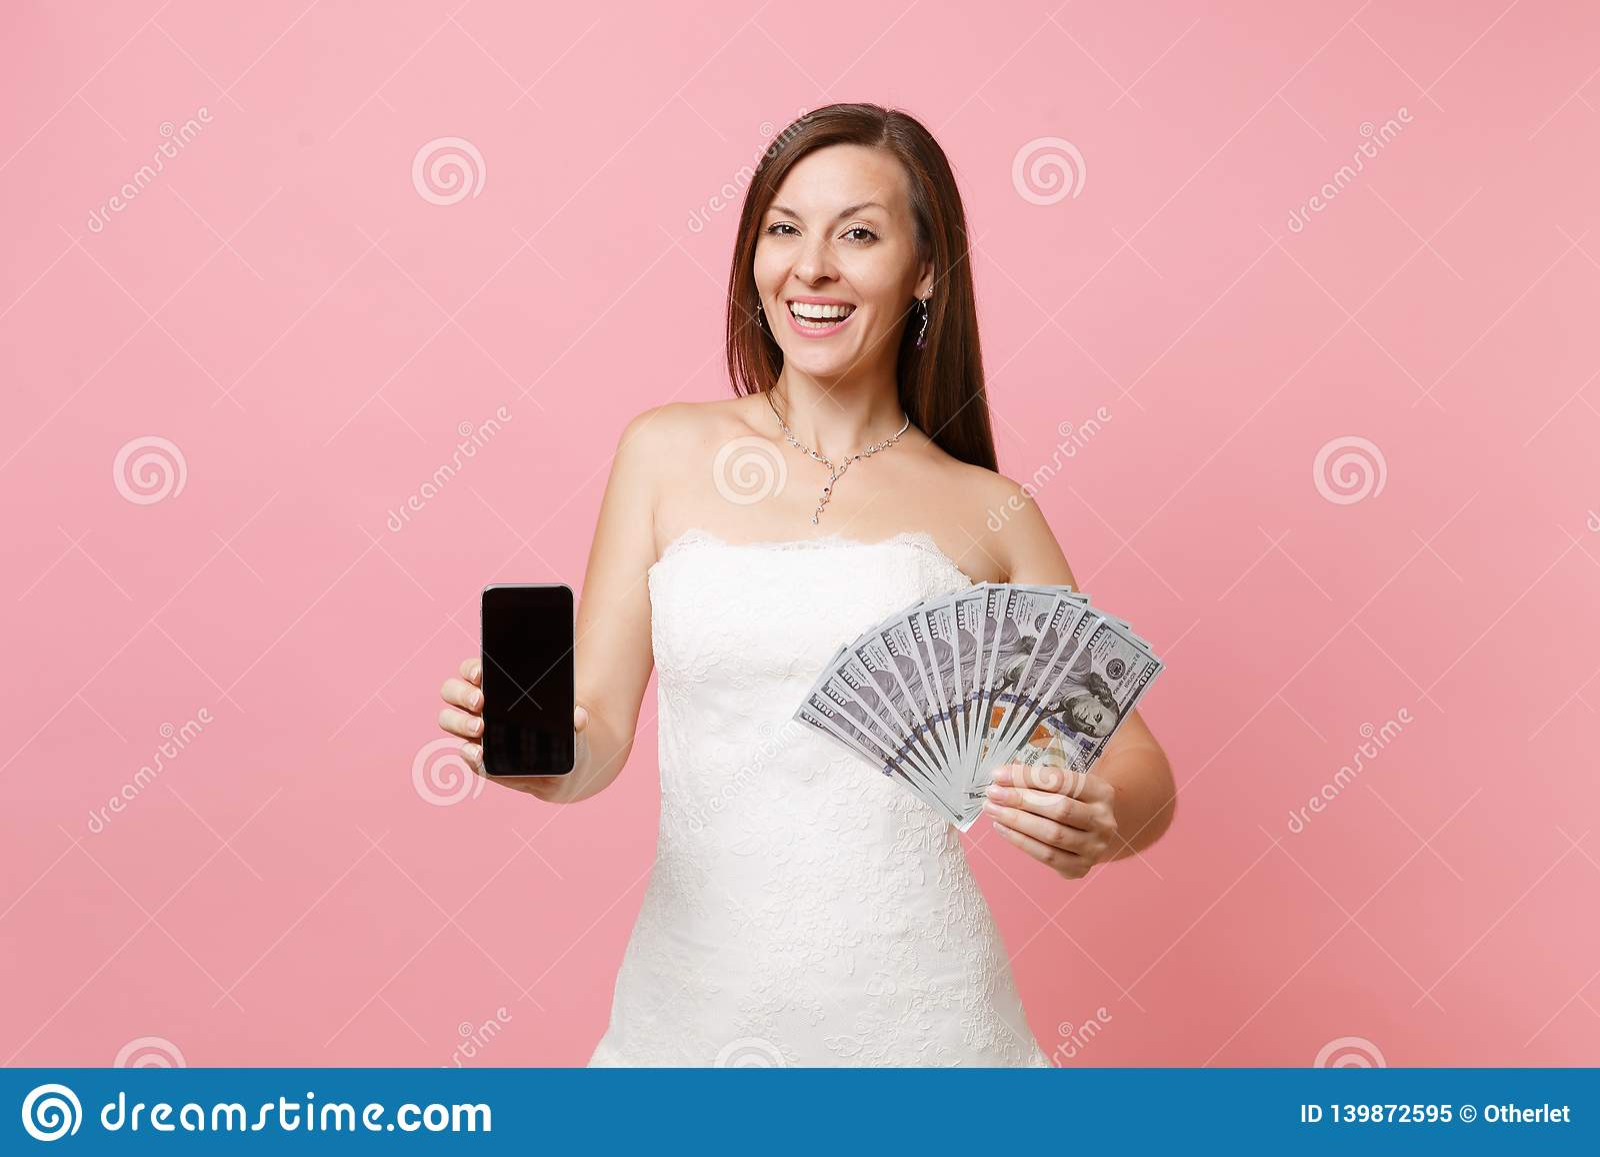 Happy Bride Woman In Wedding Dress Holding Bundle Lots Of Dollars